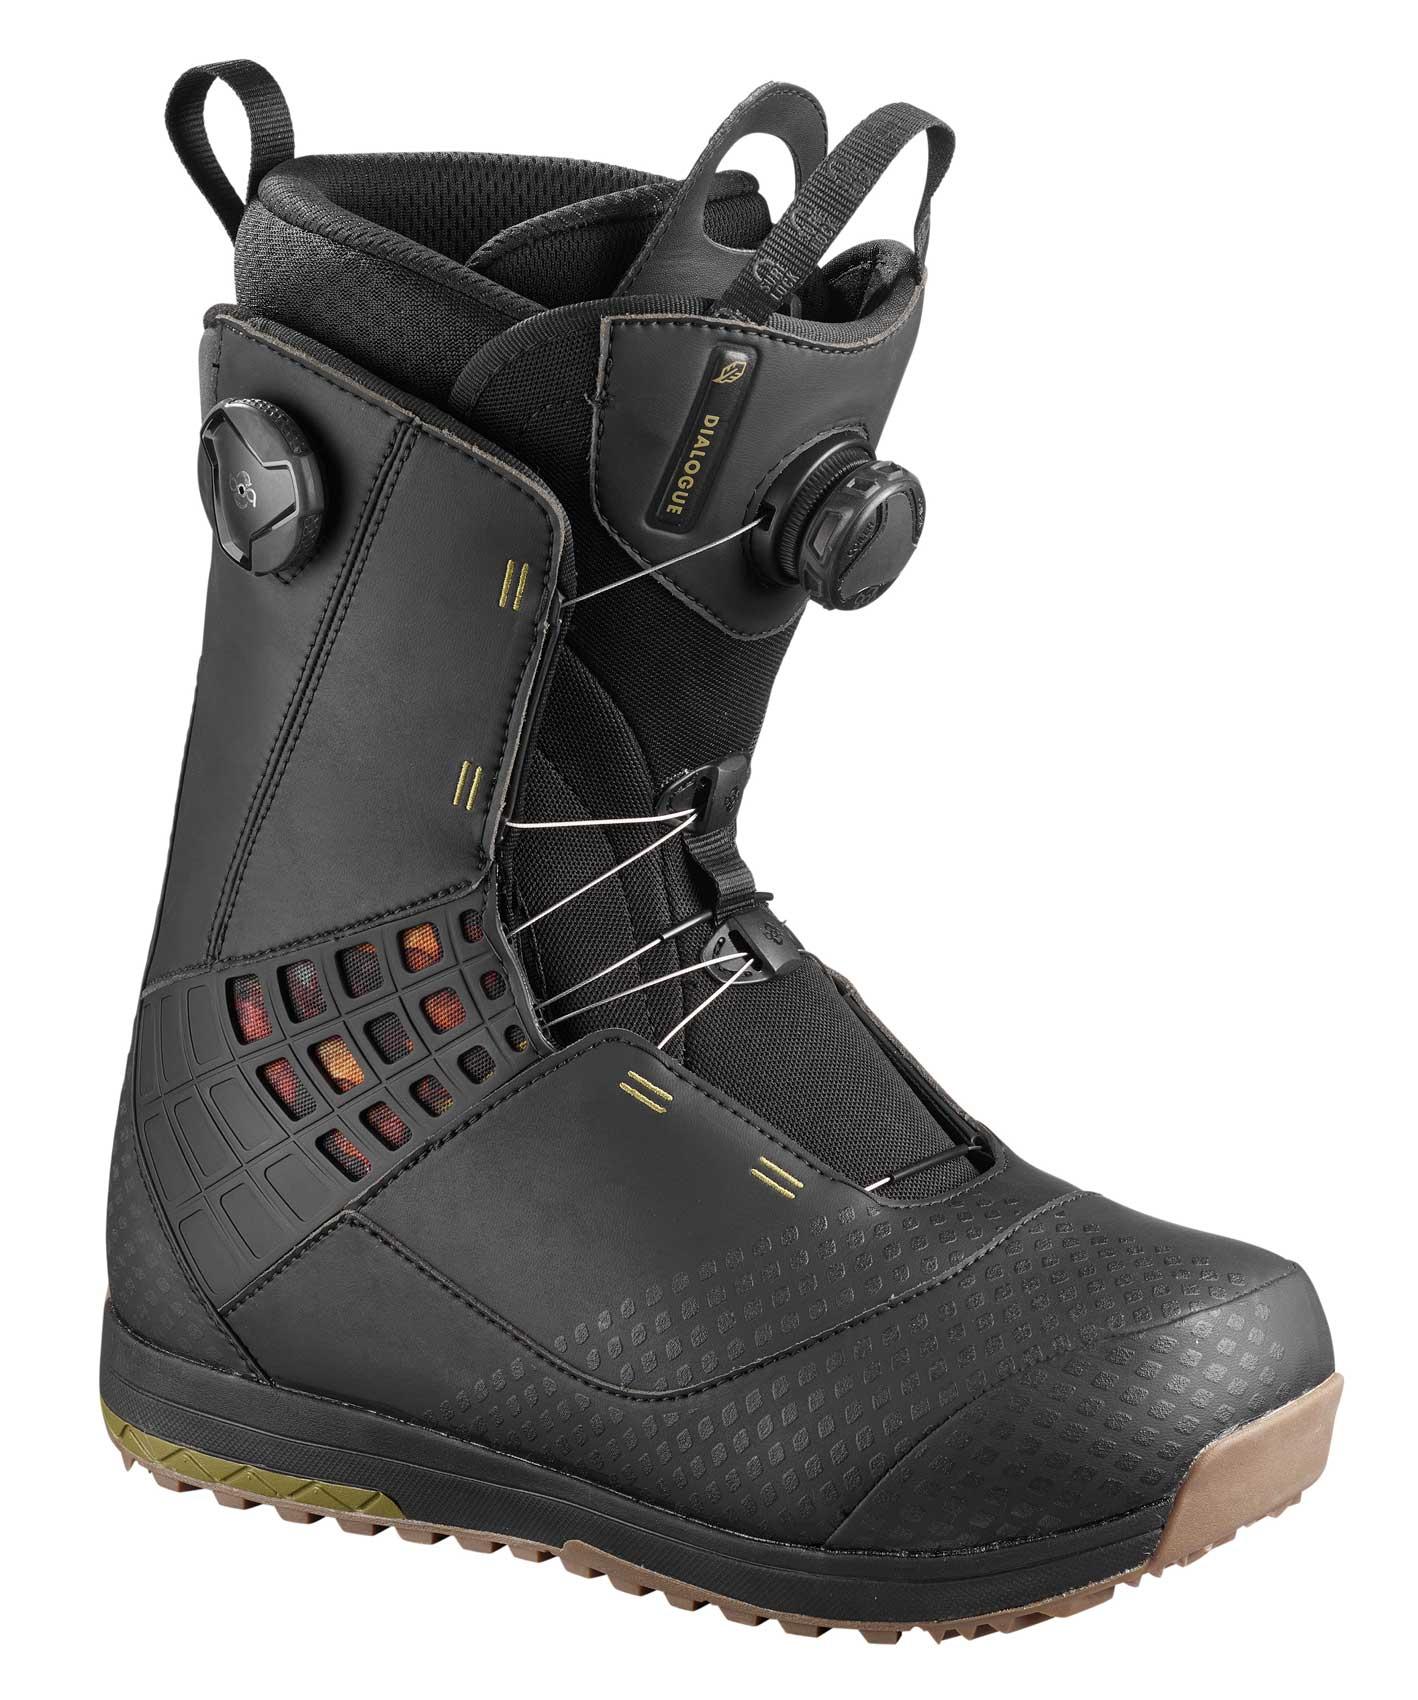 29126b4ab9ee Salomon Dialogue Focus BOA Snowboard Boots 2019